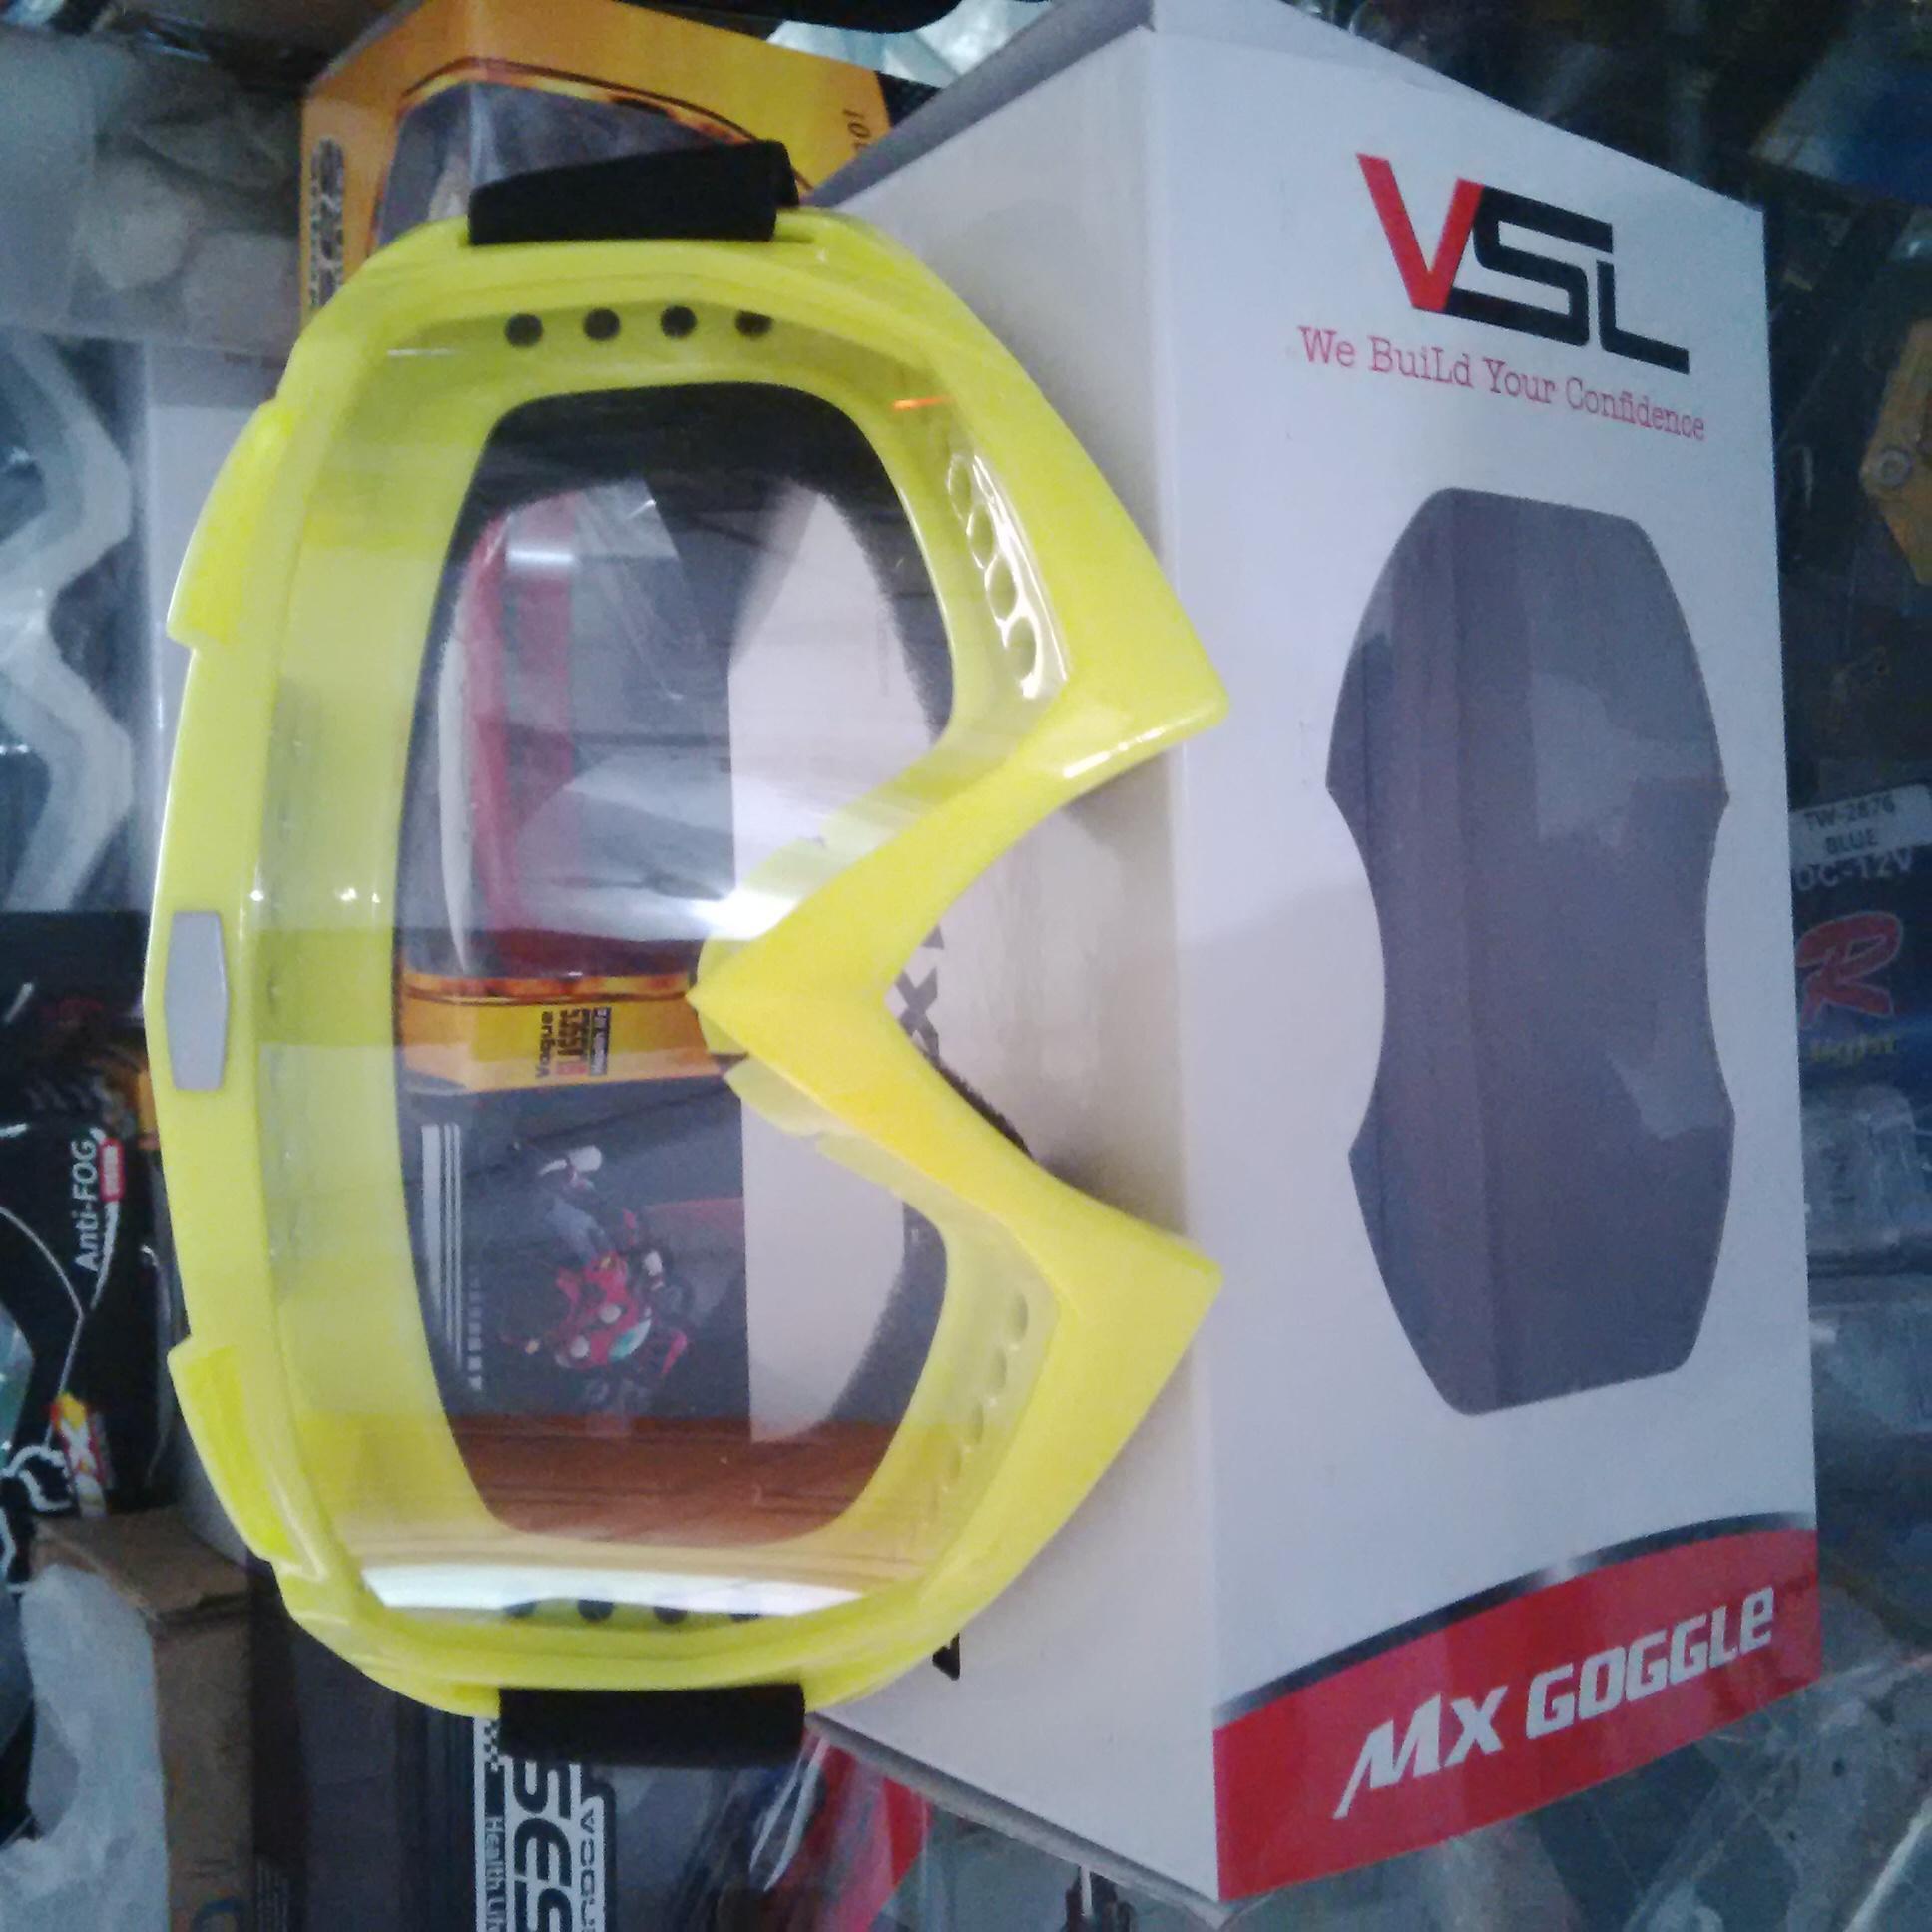 Kacamata Cross Goggle Bening Stabilo VSL